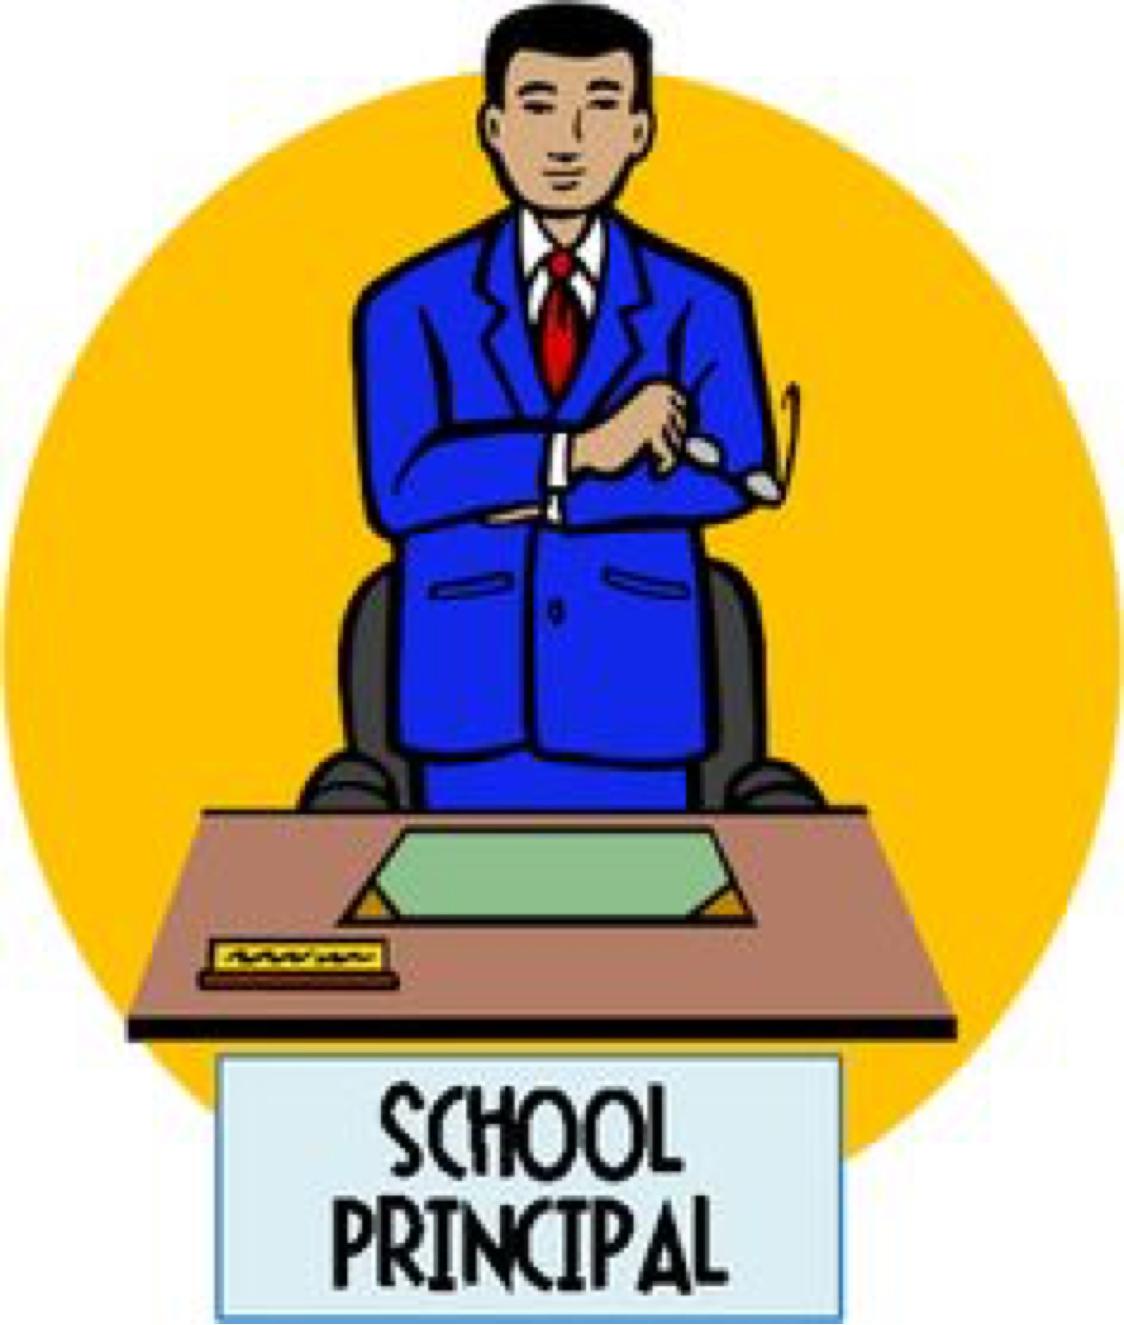 Clipart School Principal.